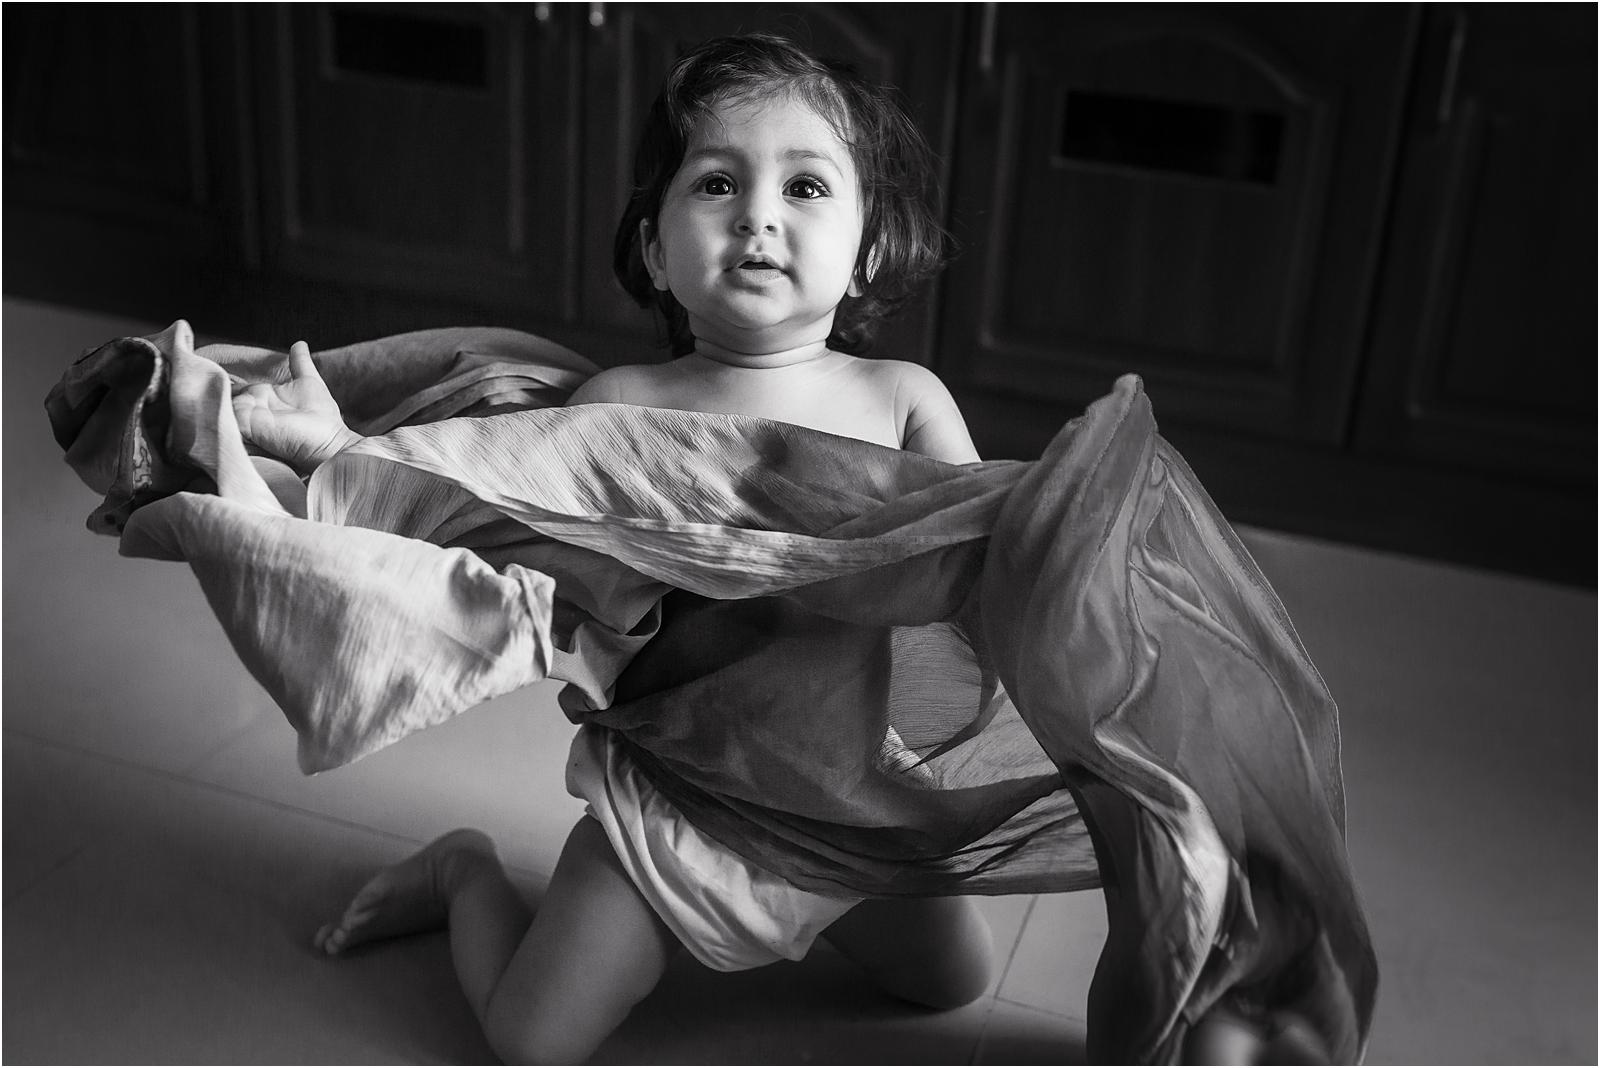 27042017-Deeksha-turns-one-family-shoot-277-Edit.JPG